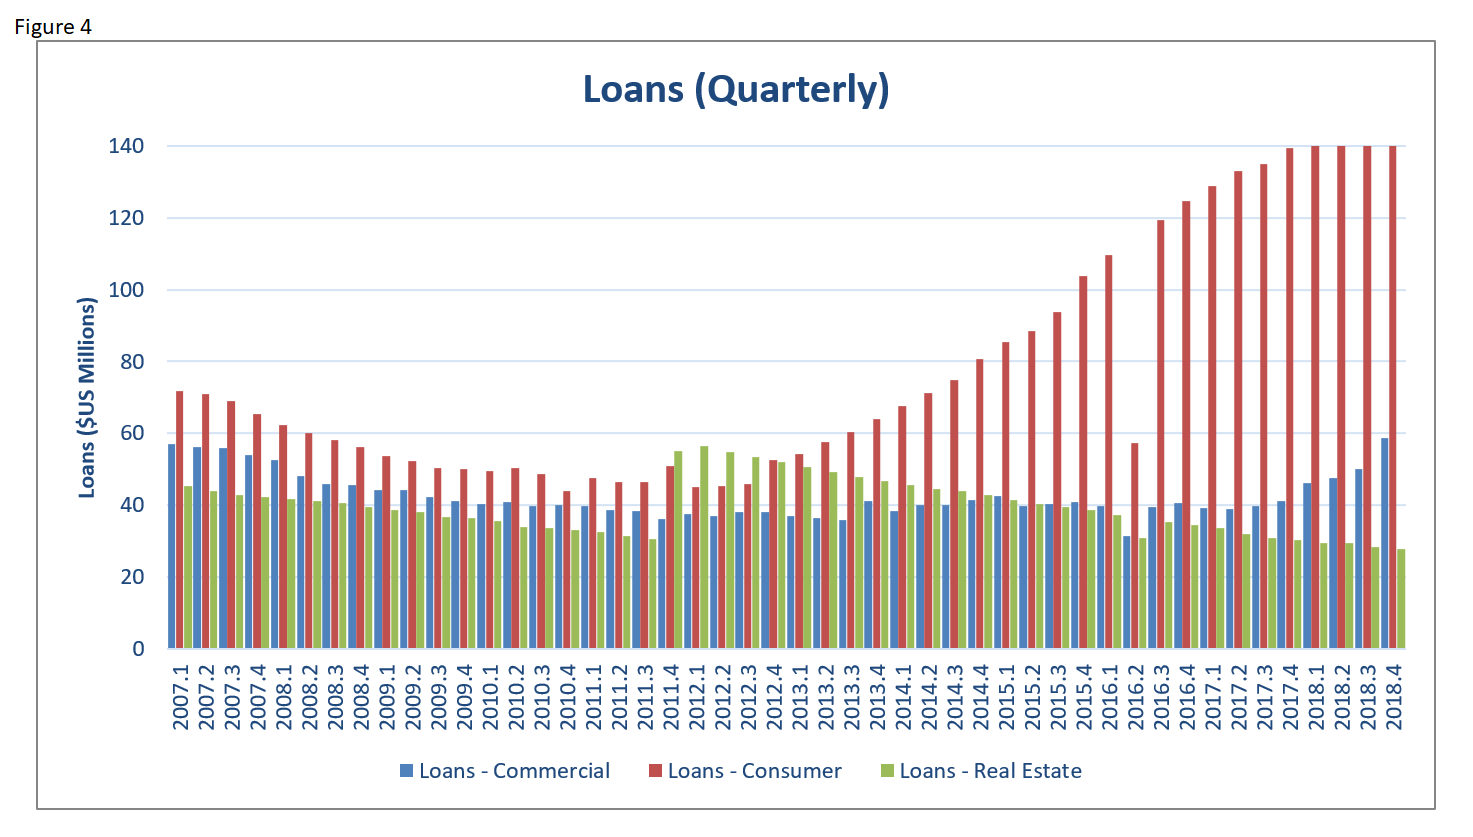 EI 2018 Banking Loans Quarterly